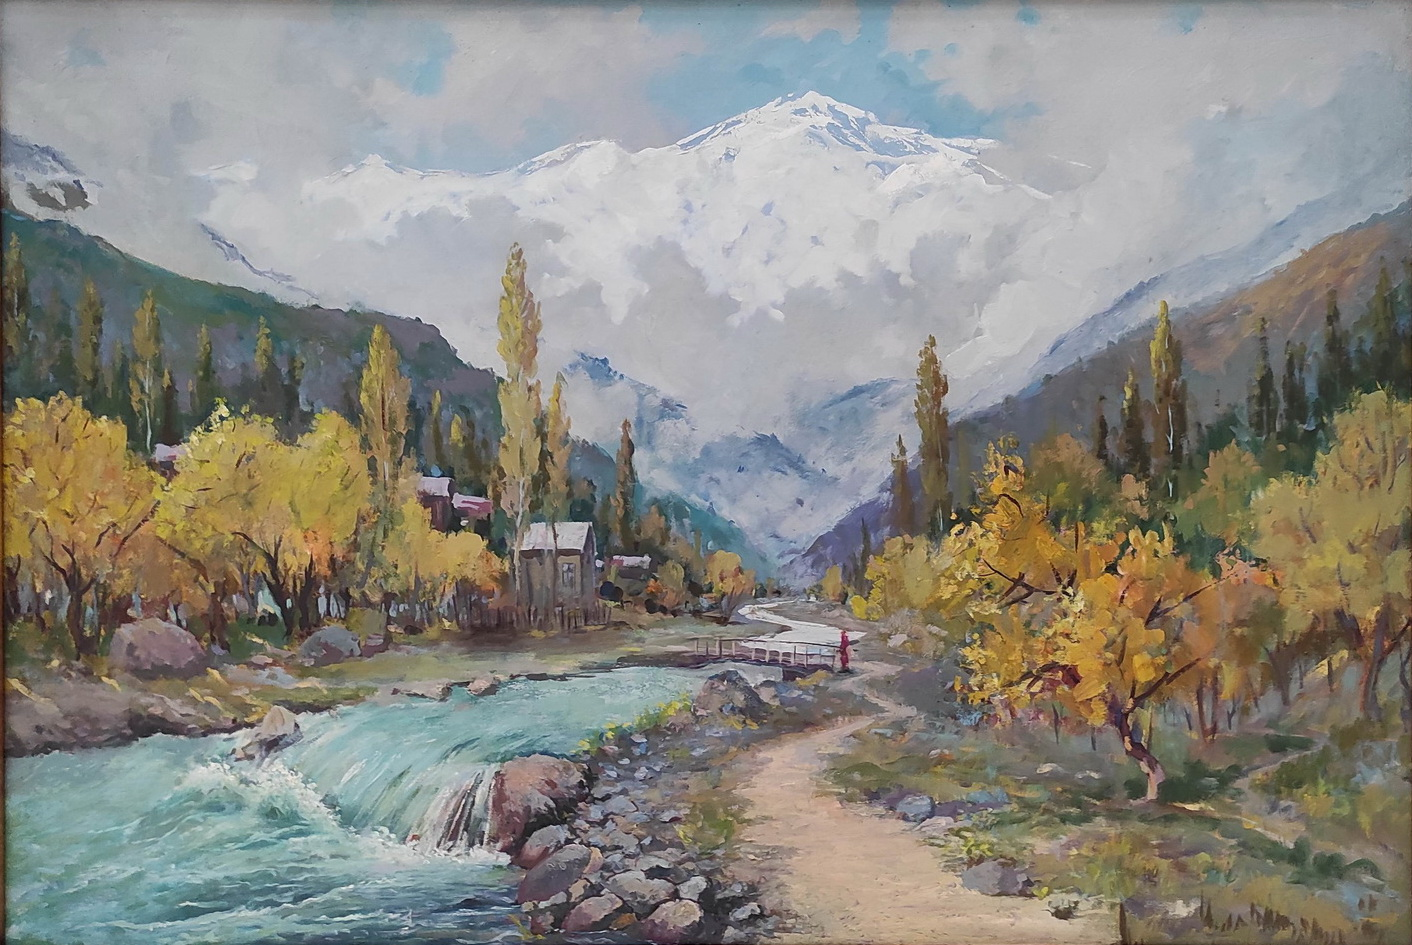 Рахматуллаев С. Осенний пейзаж. 2020 (Коканд)